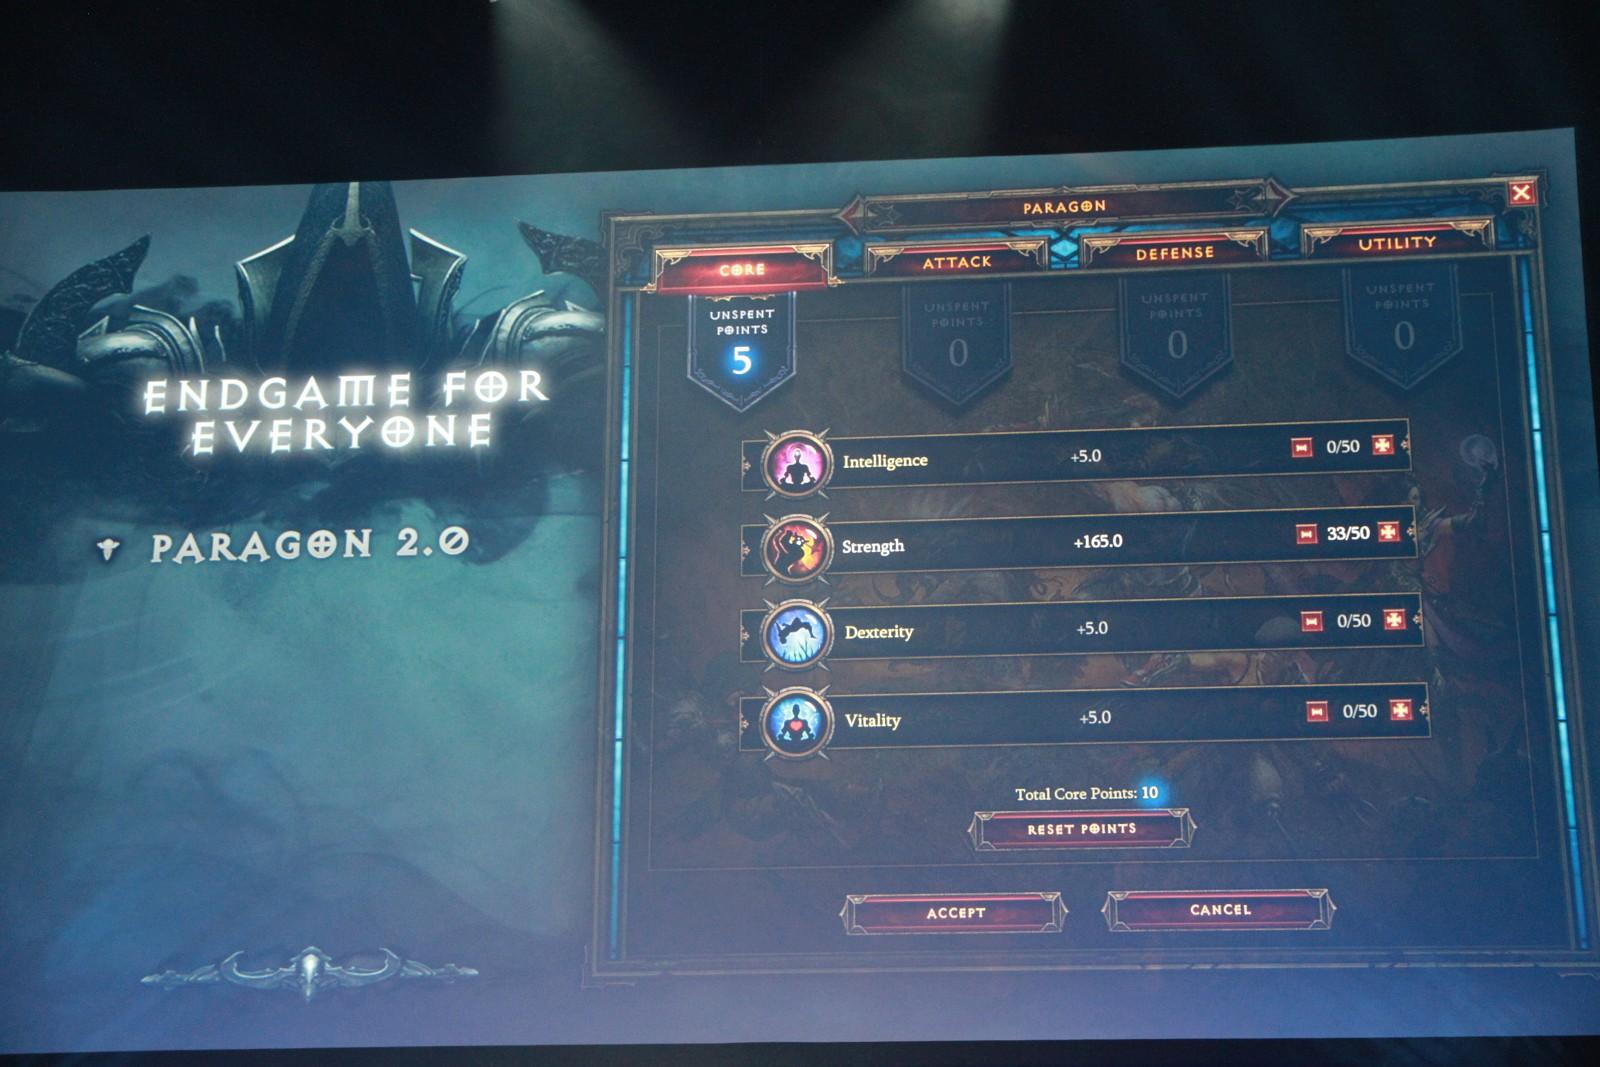 Reaper of souls nouvelle extension de Diablo III 6721641129